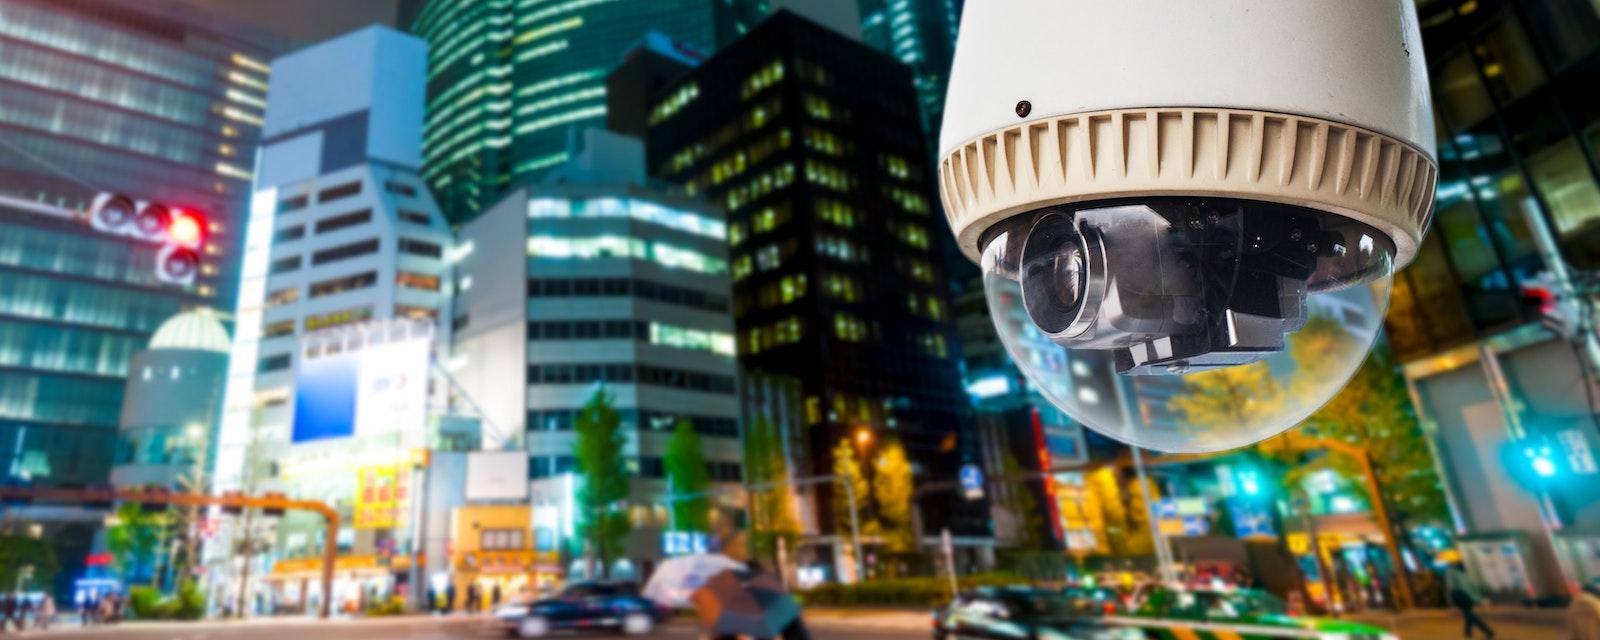 Surveilance Image